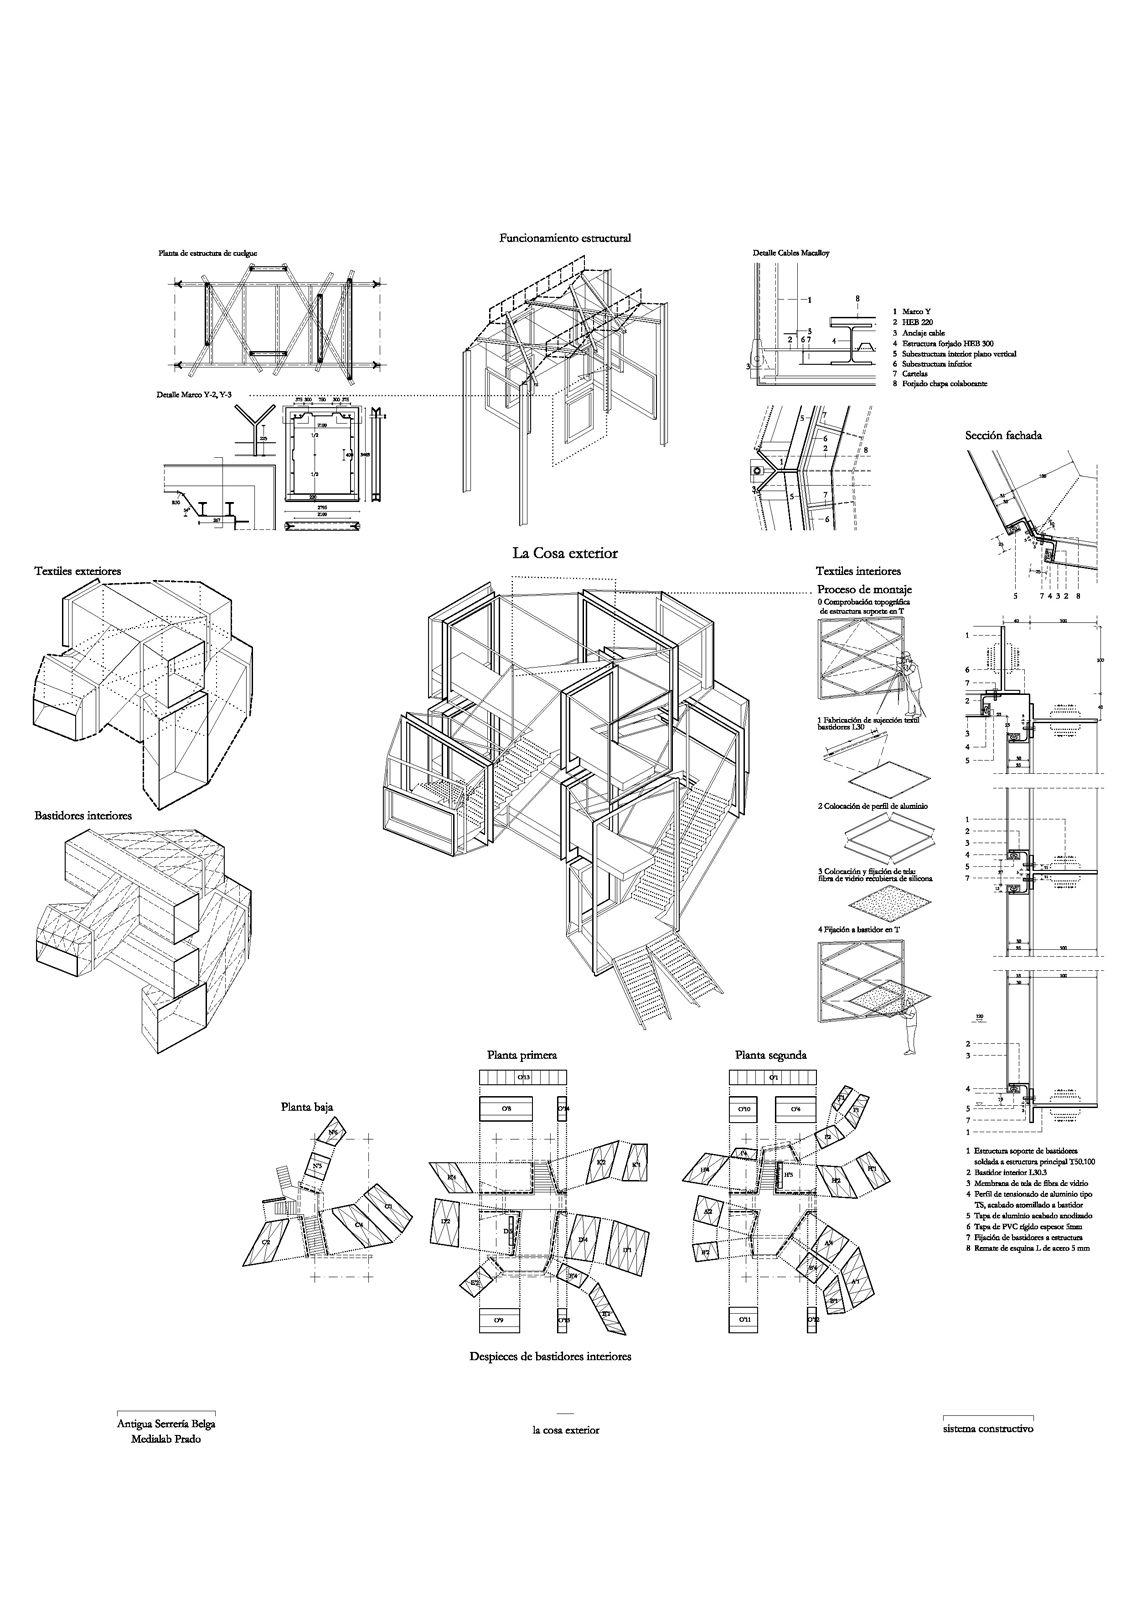 Medialab Prado By Maria Langarita And Victor Navarro